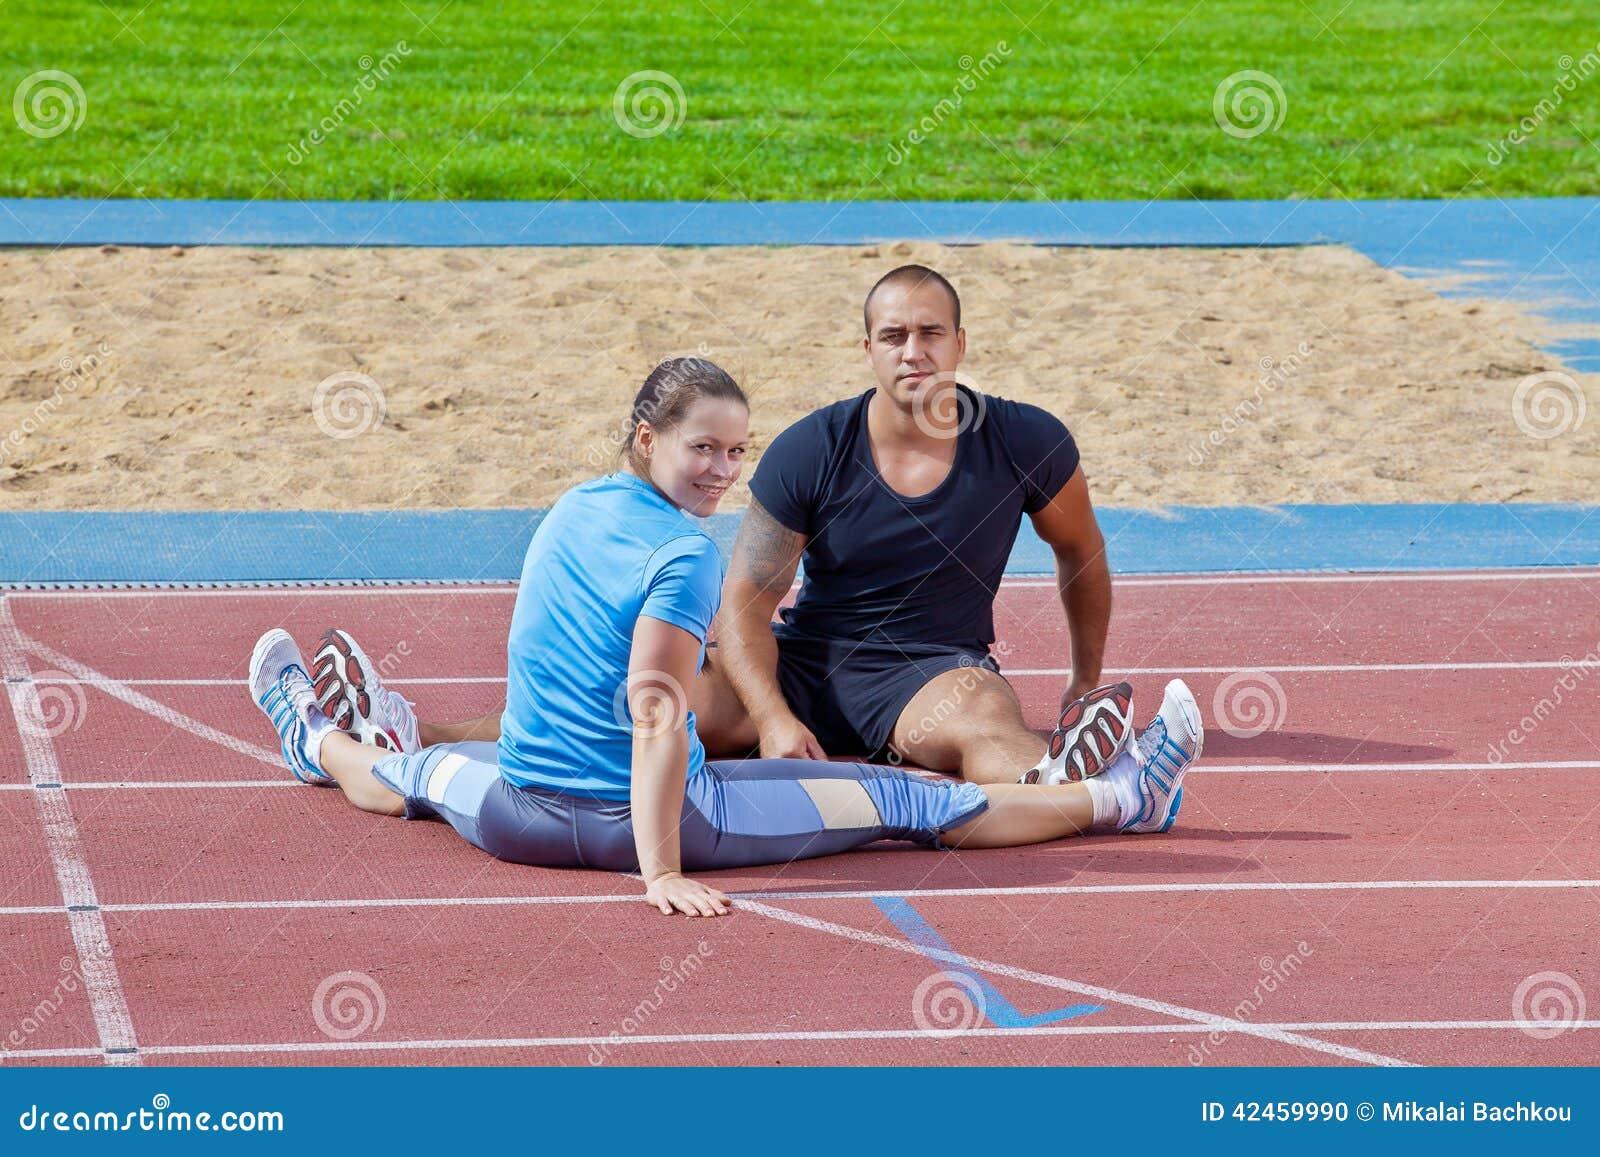 Mann und Frau am Stadion